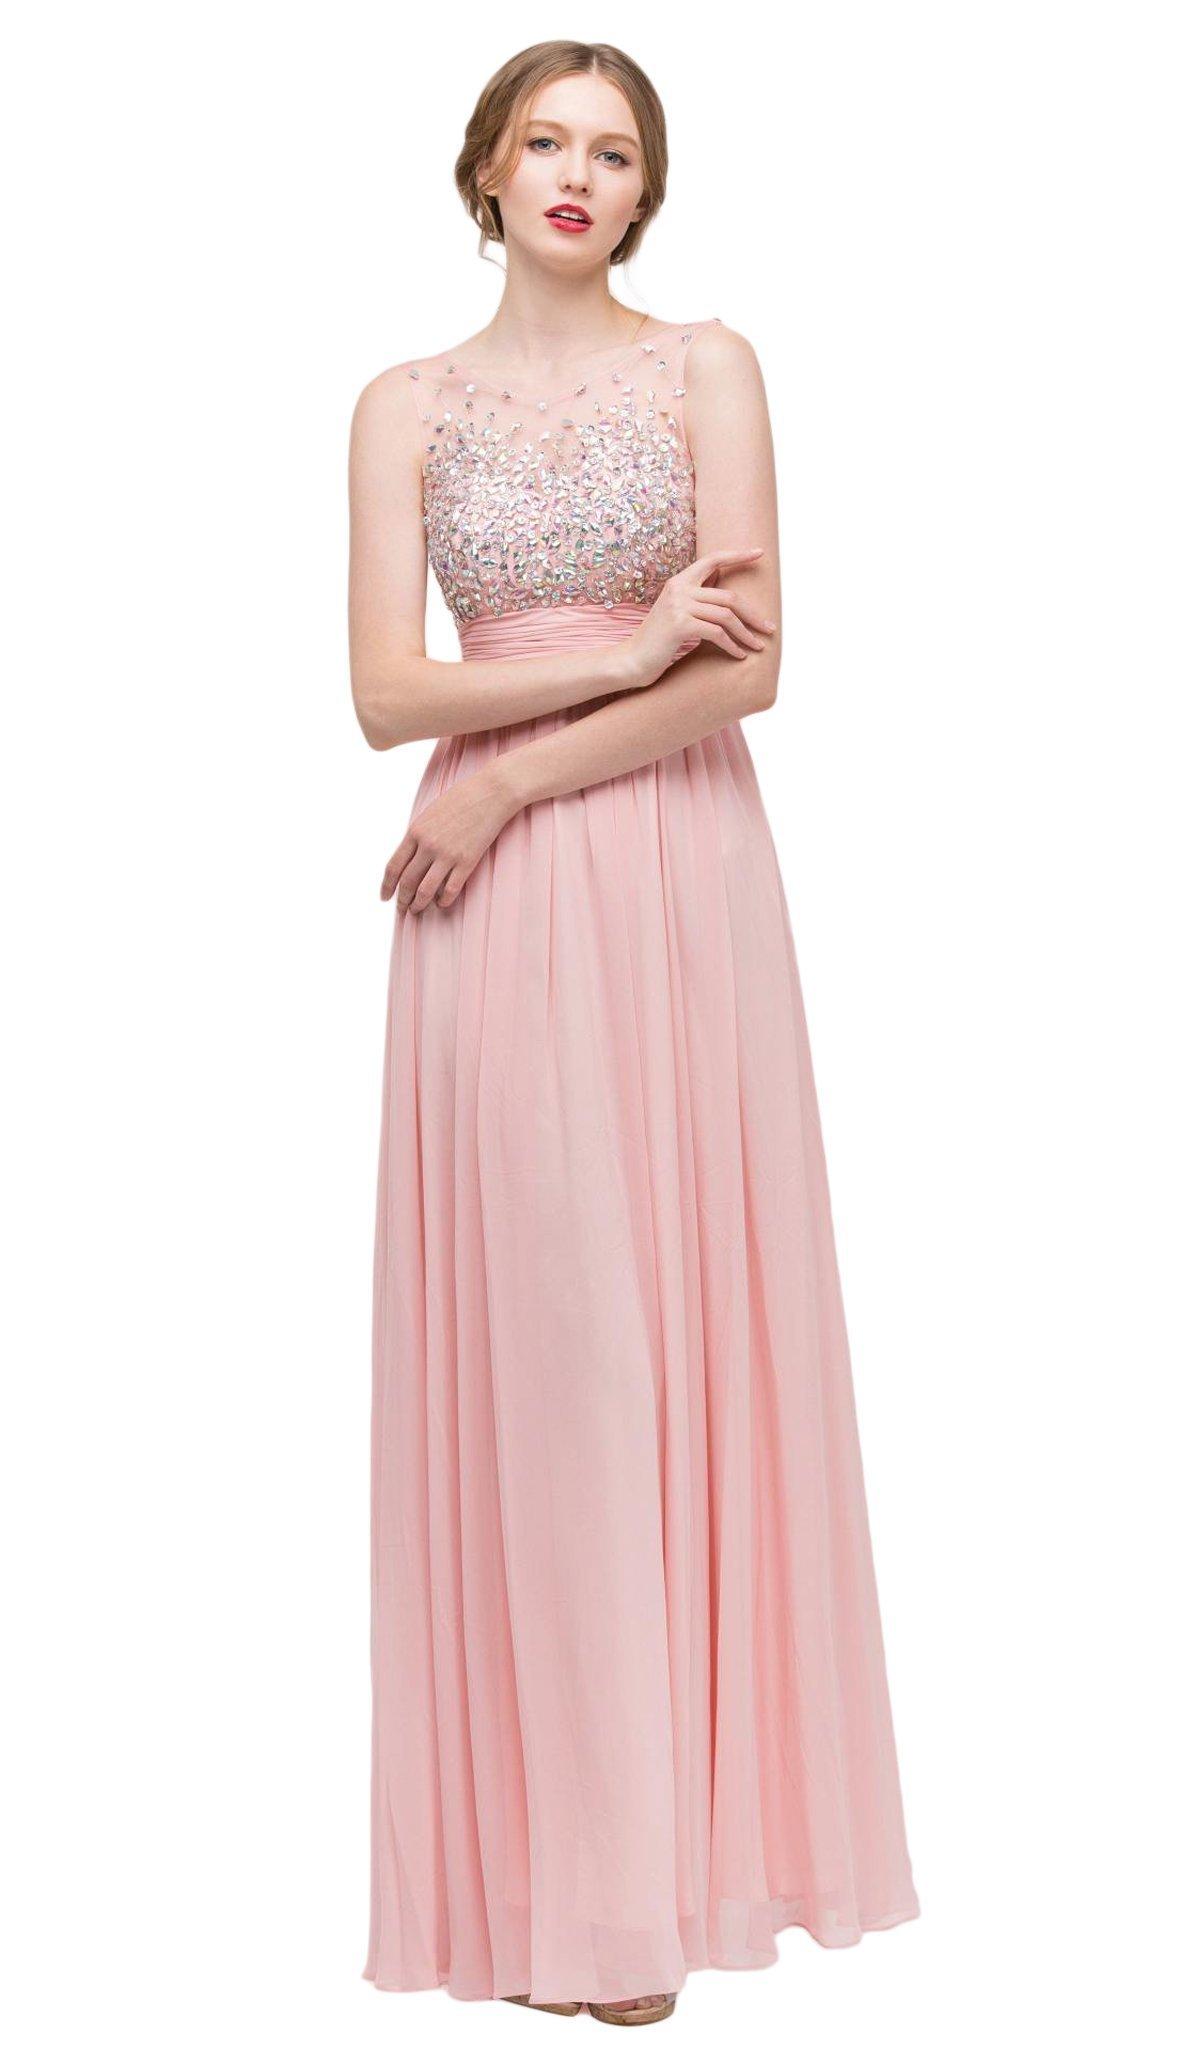 Eureka Fashion - 4001 Bejeweled Illusion Bateau Chiffon A-line Dress